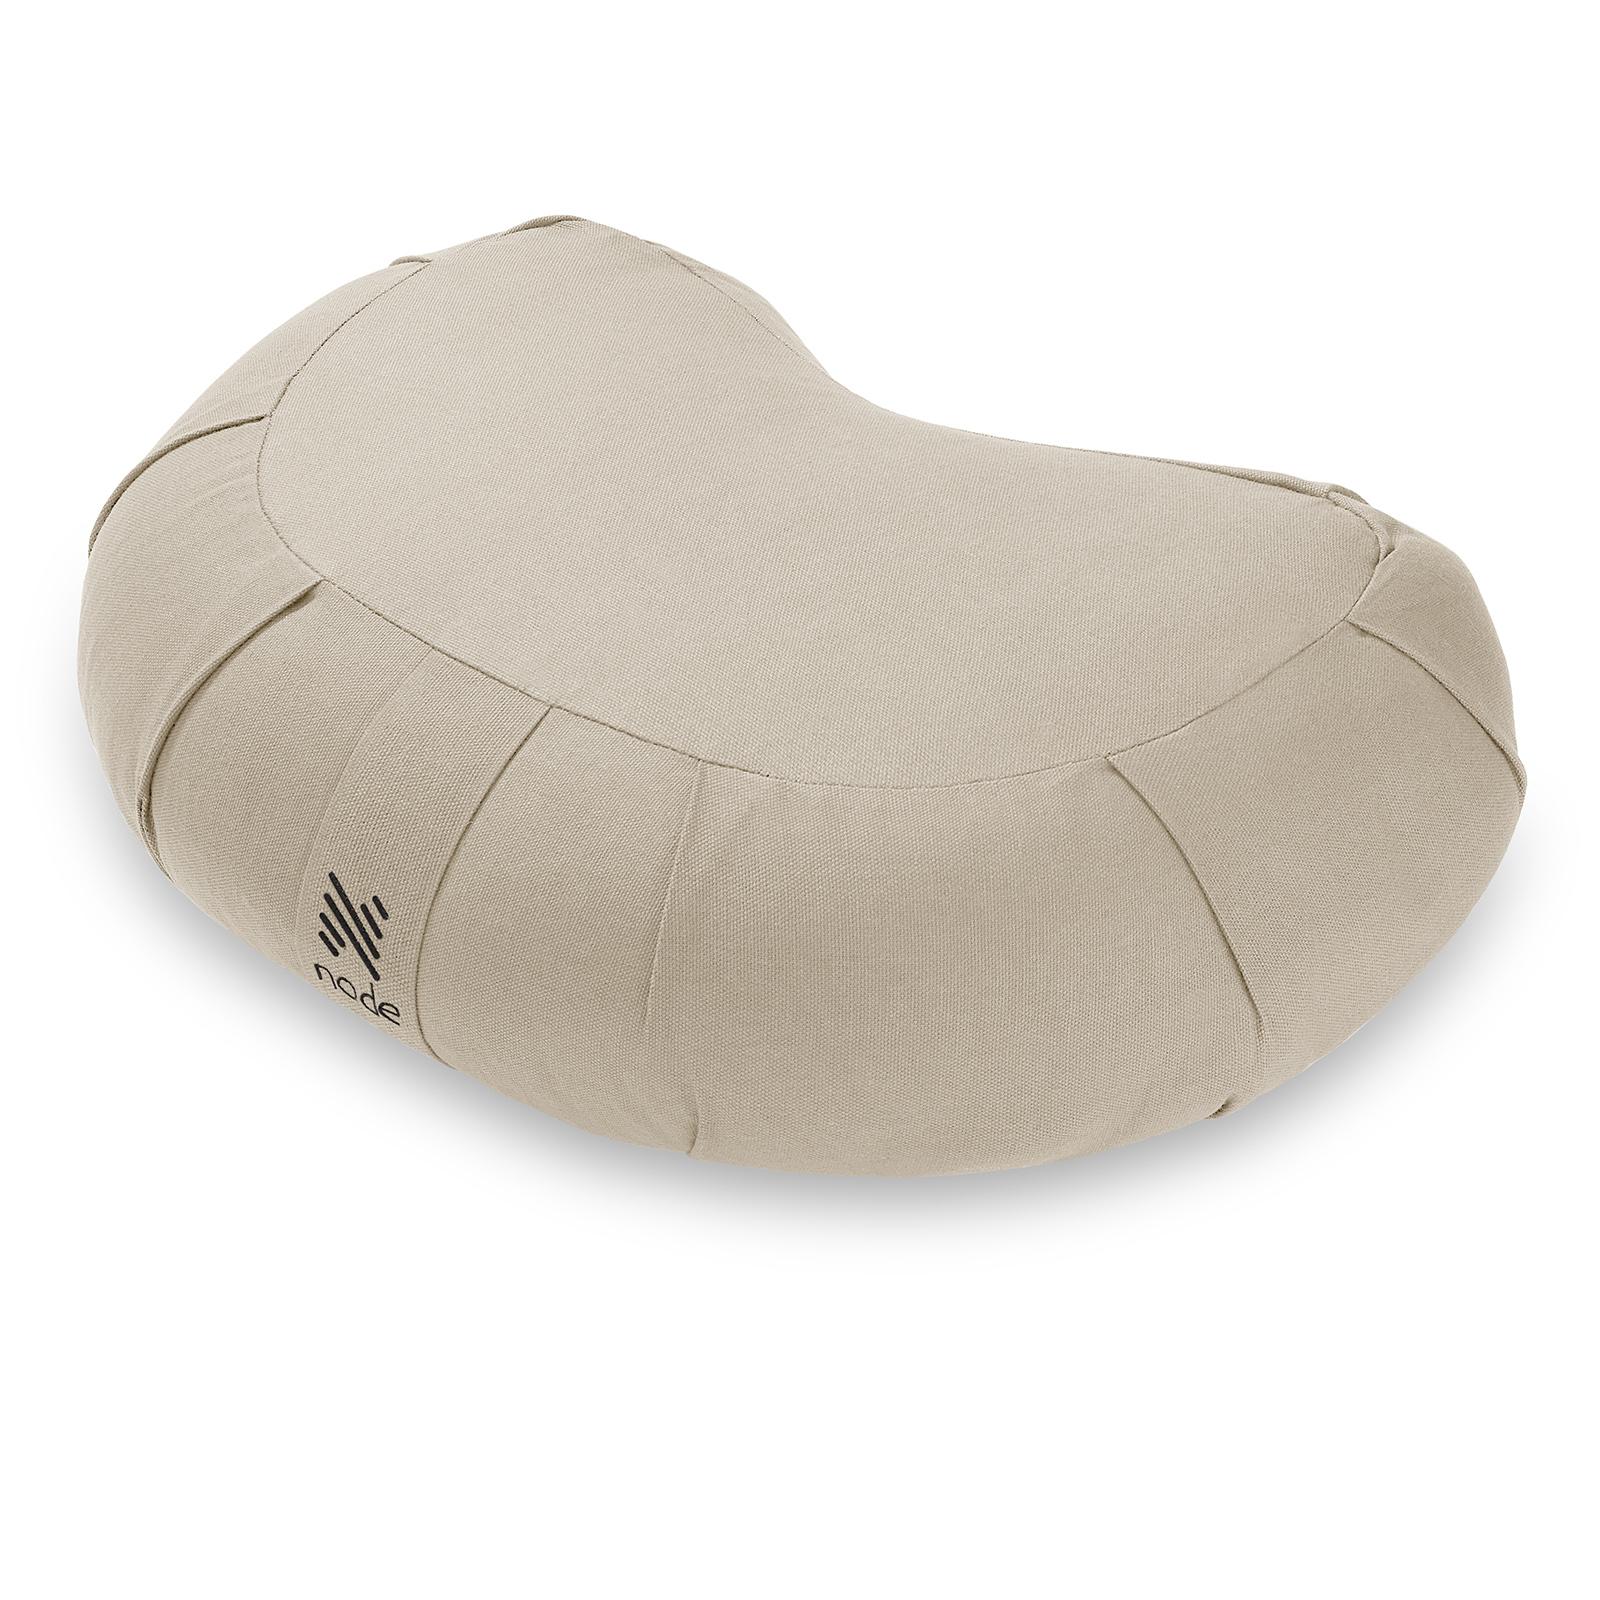 Node Fitness Organic Cotton 17 Crescent Meditation Cushion